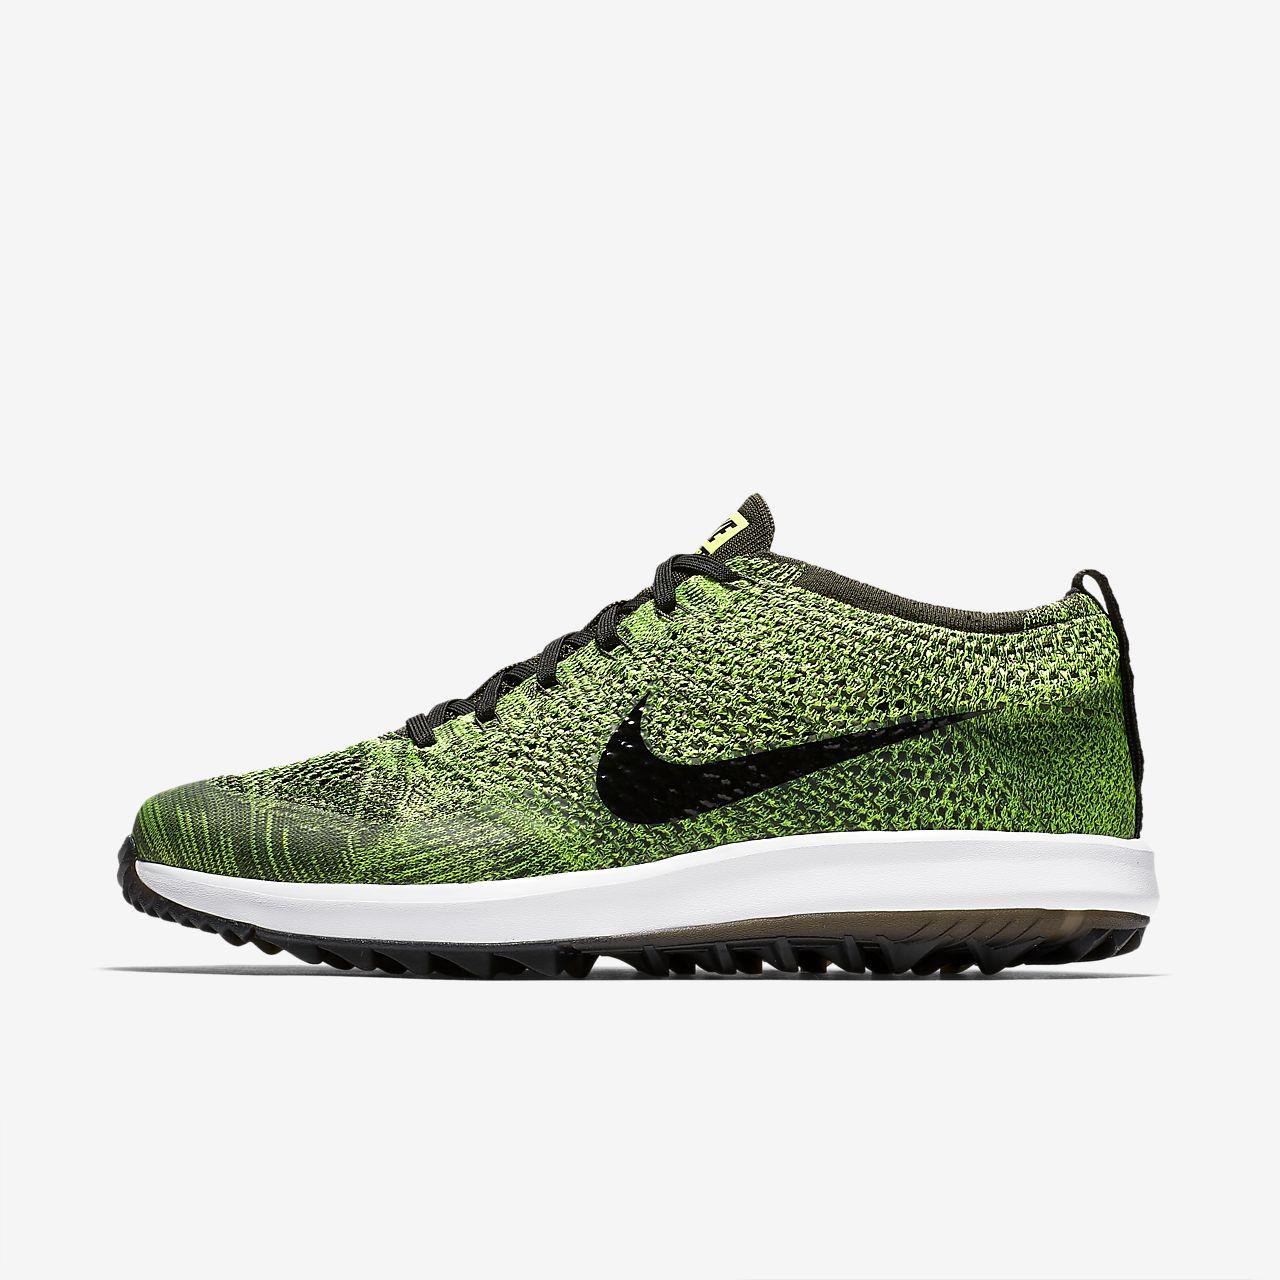 dece1dd842da Nike Flyknit Racer G Men s Golf Shoe. Nike.com GB